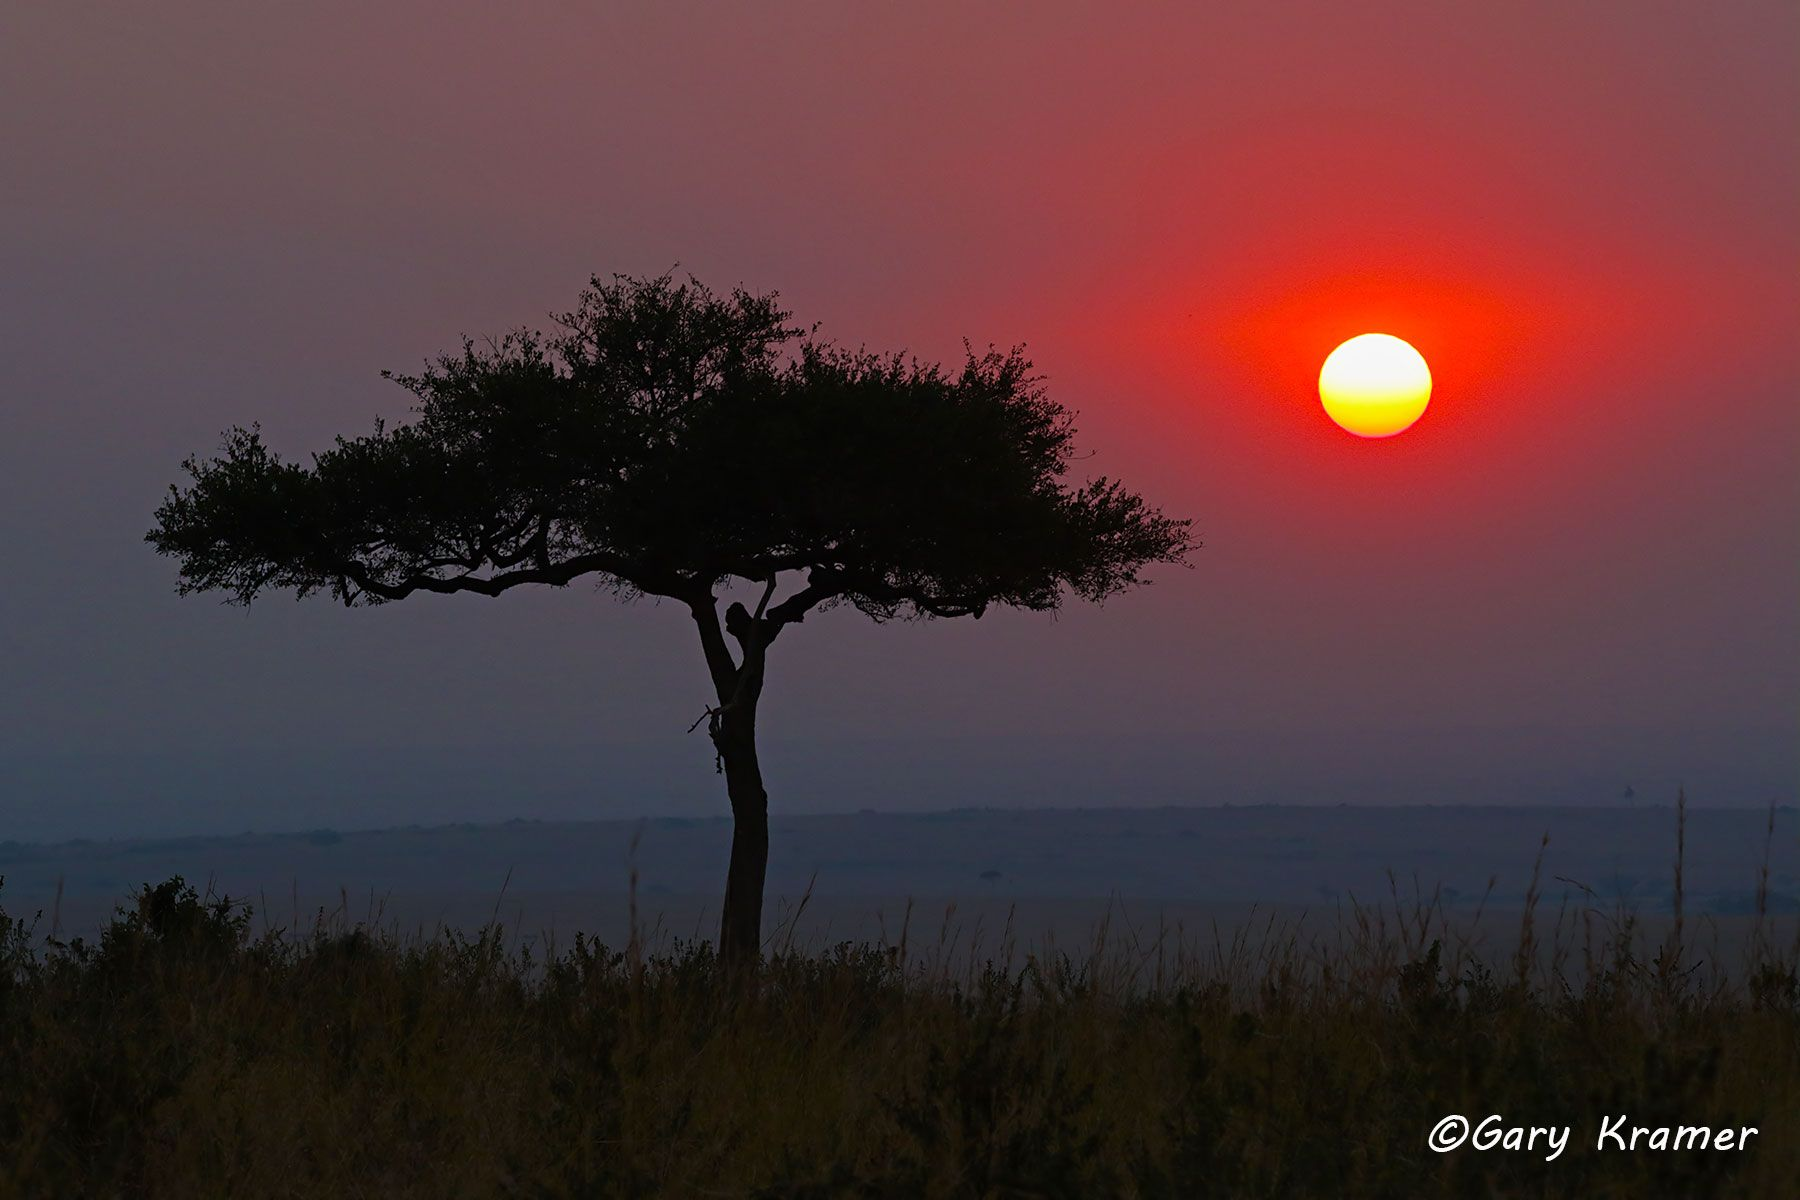 Sunset at Maasai Mara National Reserve, Kenya - ASKus#008d